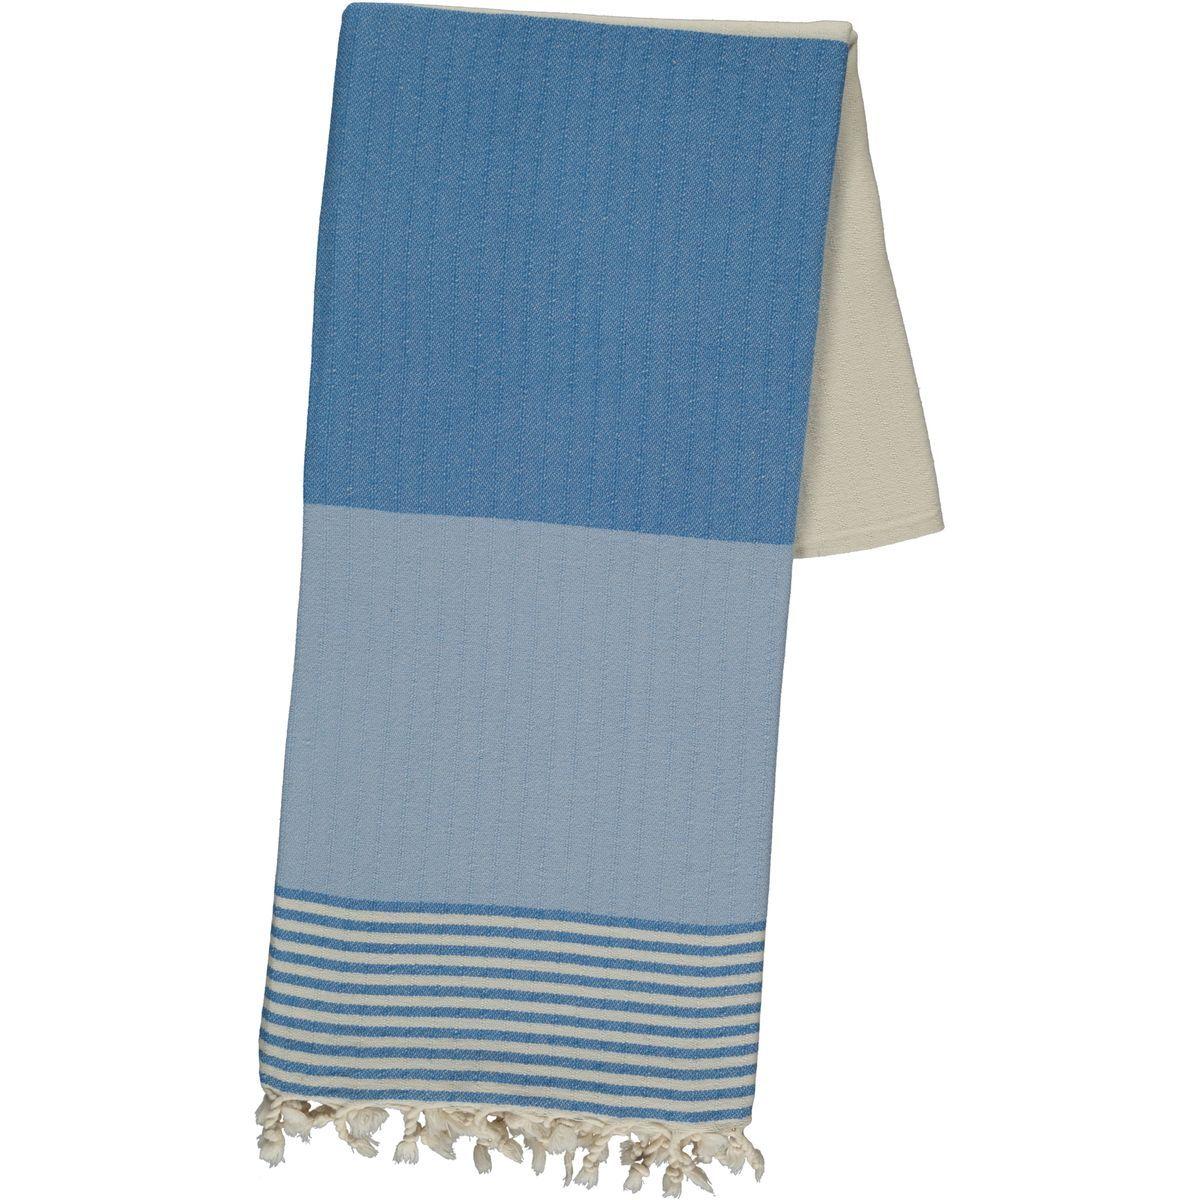 Peştemal İkiz Sultan - Koyu Mavi / Mavi